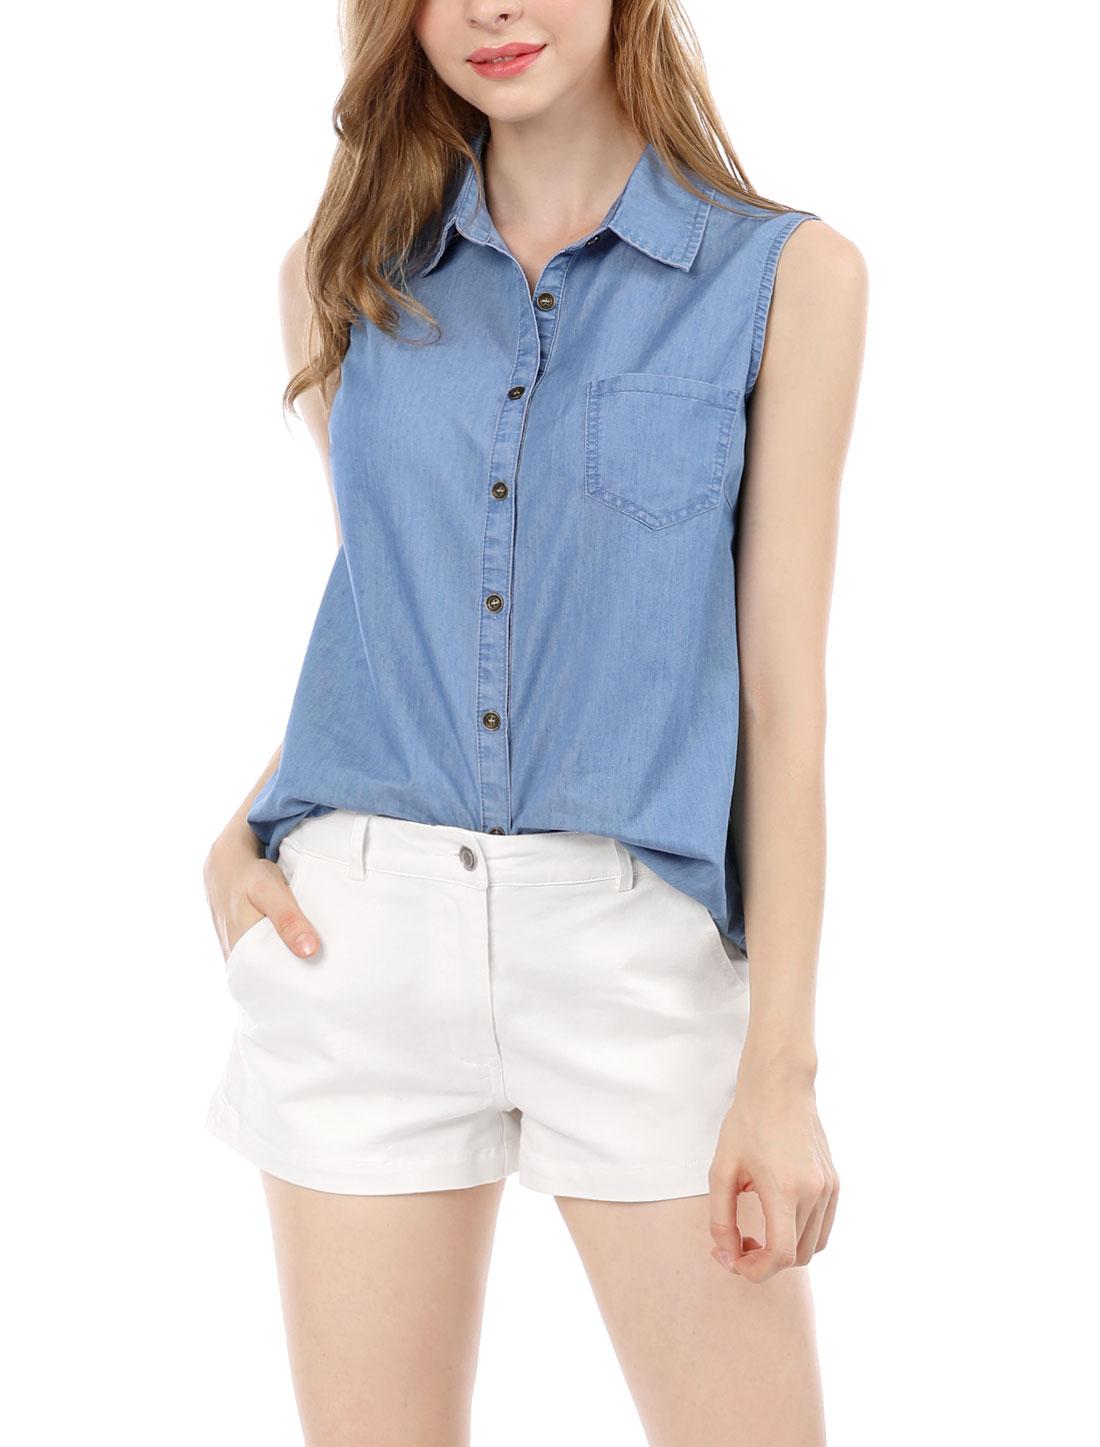 Allegra K Women Single Breasted Collar Sleeveless Shirt Blue XS